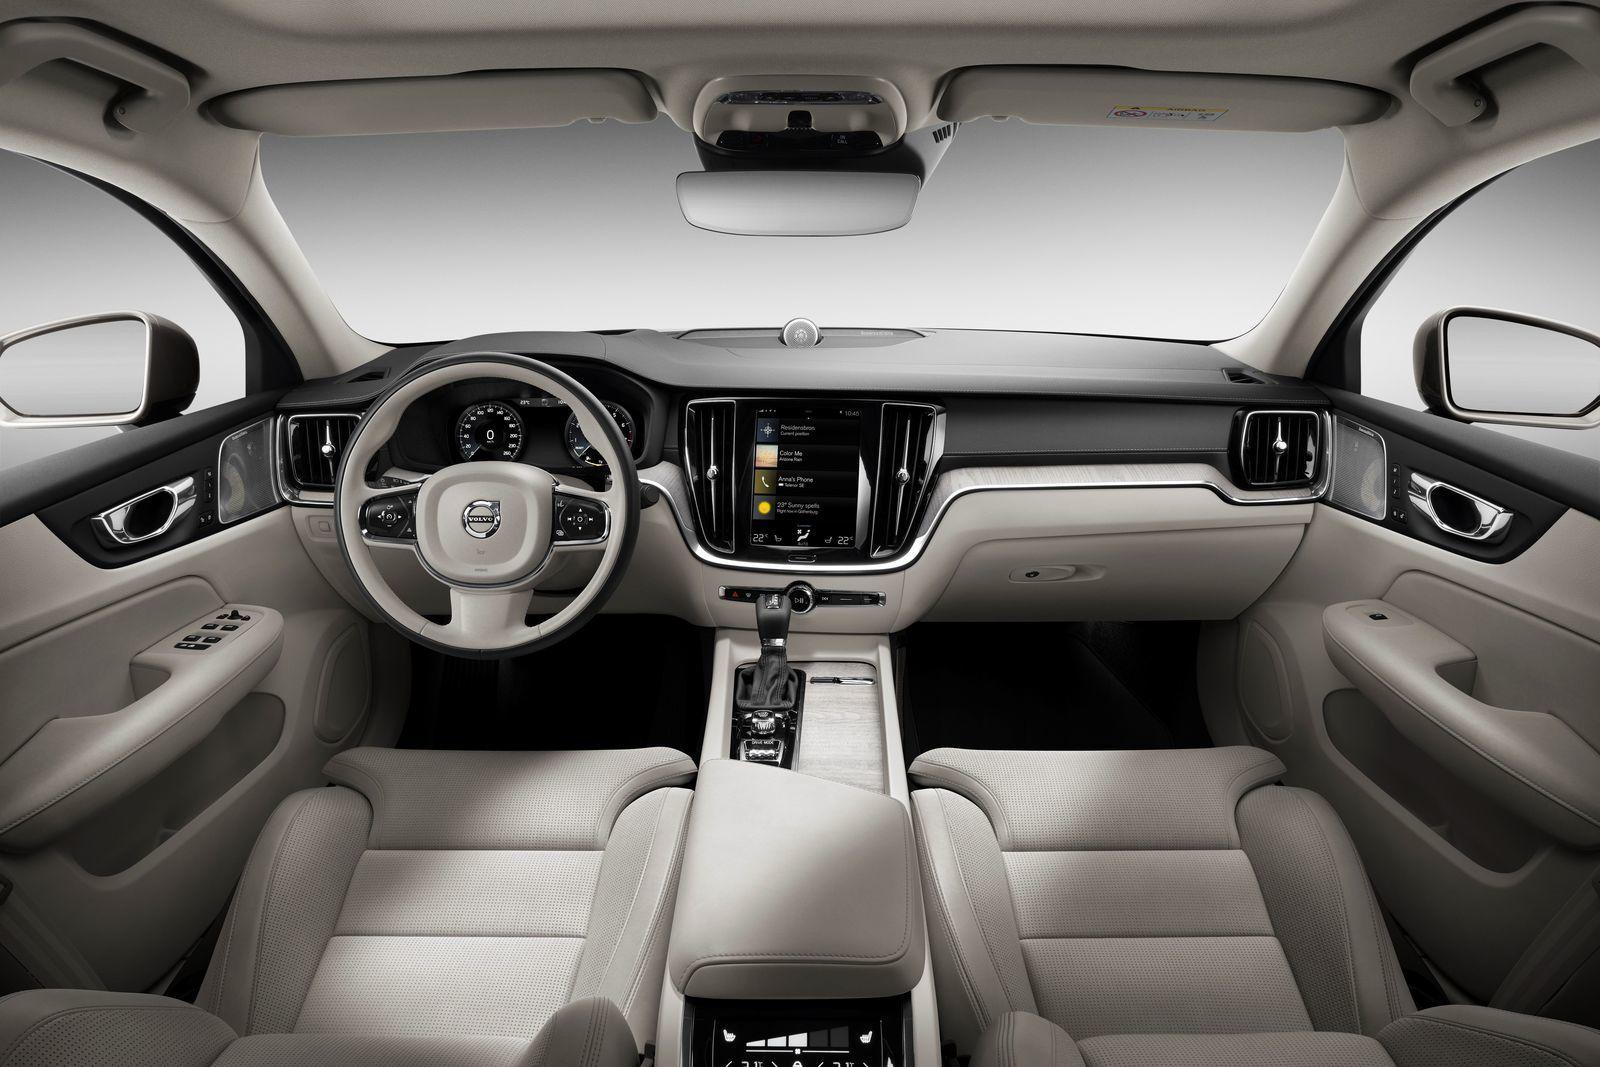 Volvo S60 : La berline qui évite d'acheter allemand